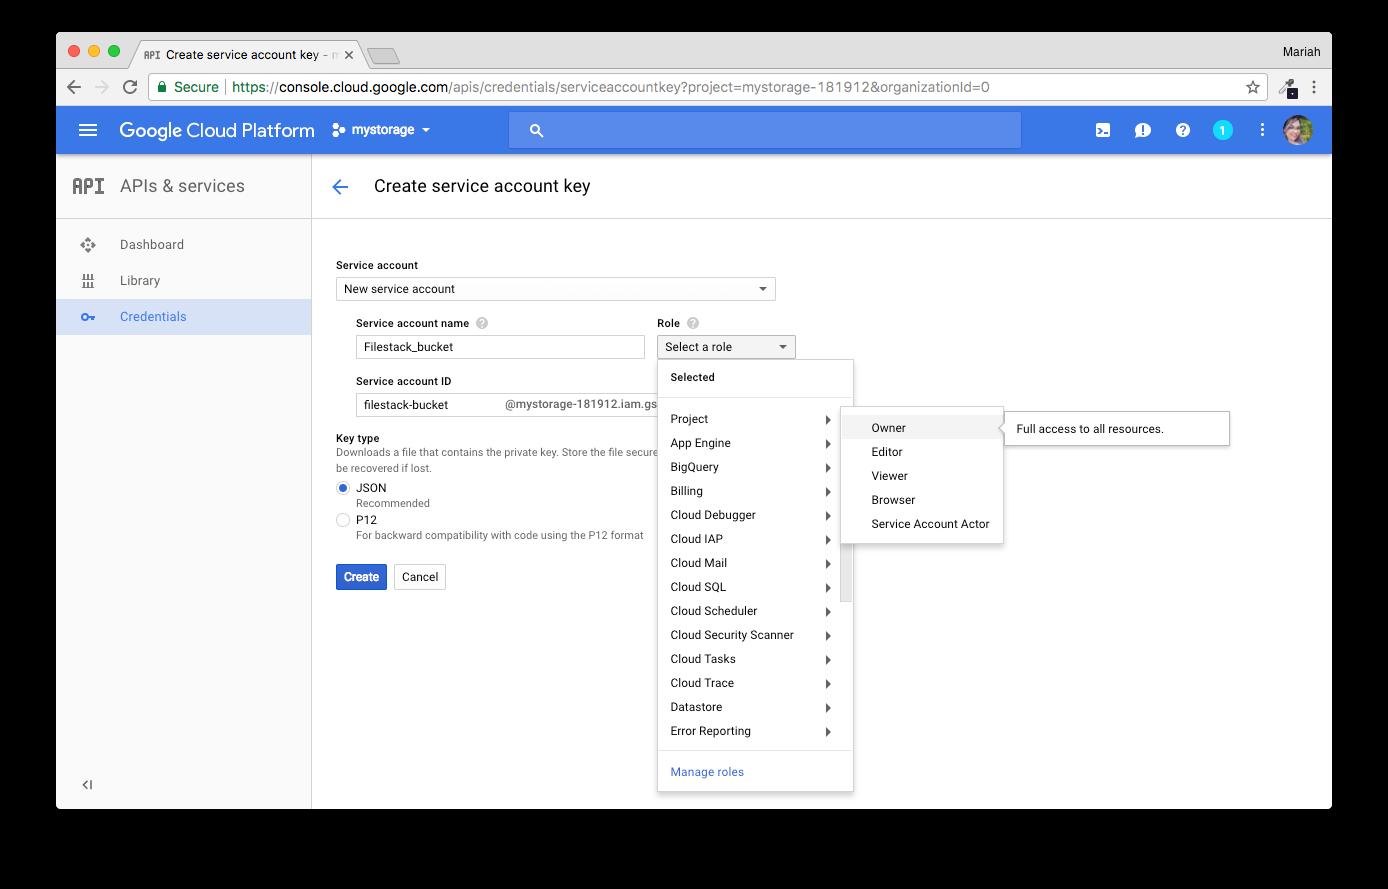 Screenshot showing GCS Service account key creation